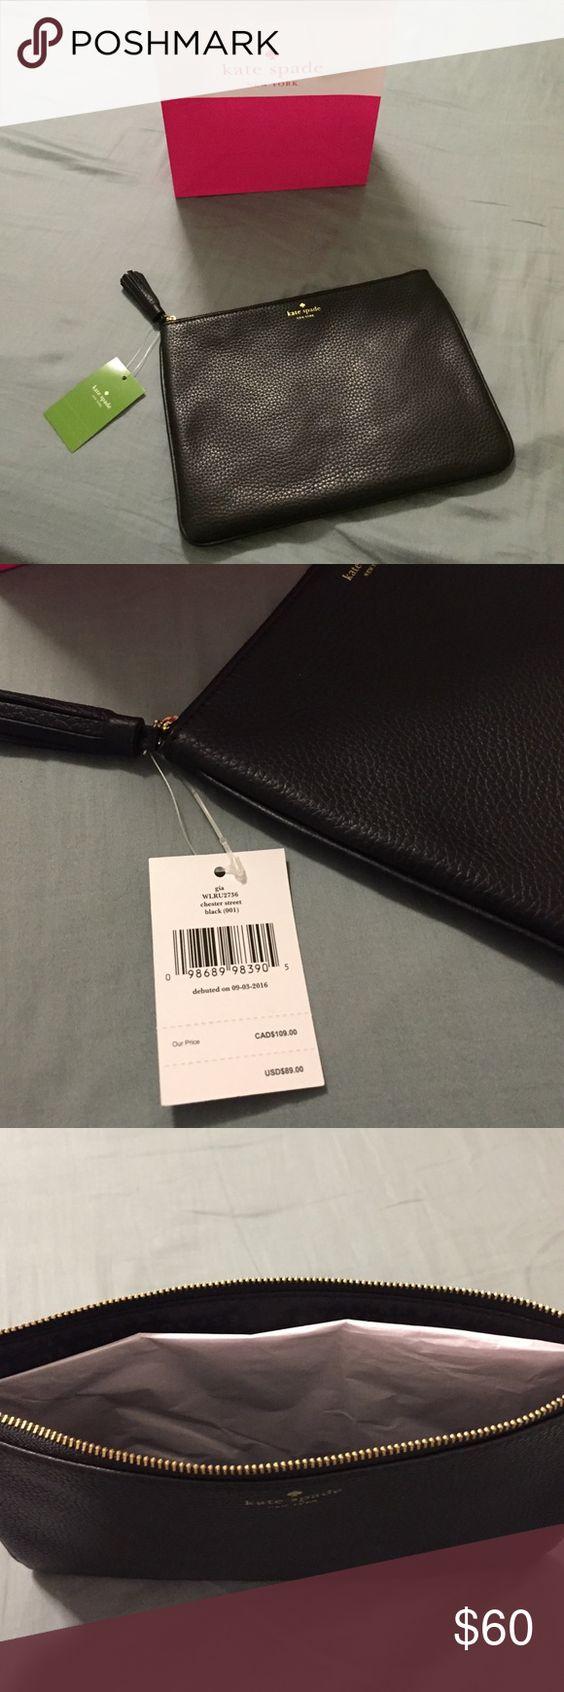 Kate Spade Gia Black Pouch/Cosmetic Bag Black leather, Black nylon on the inside, Zipper closure kate spade Bags Cosmetic Bags & Cases